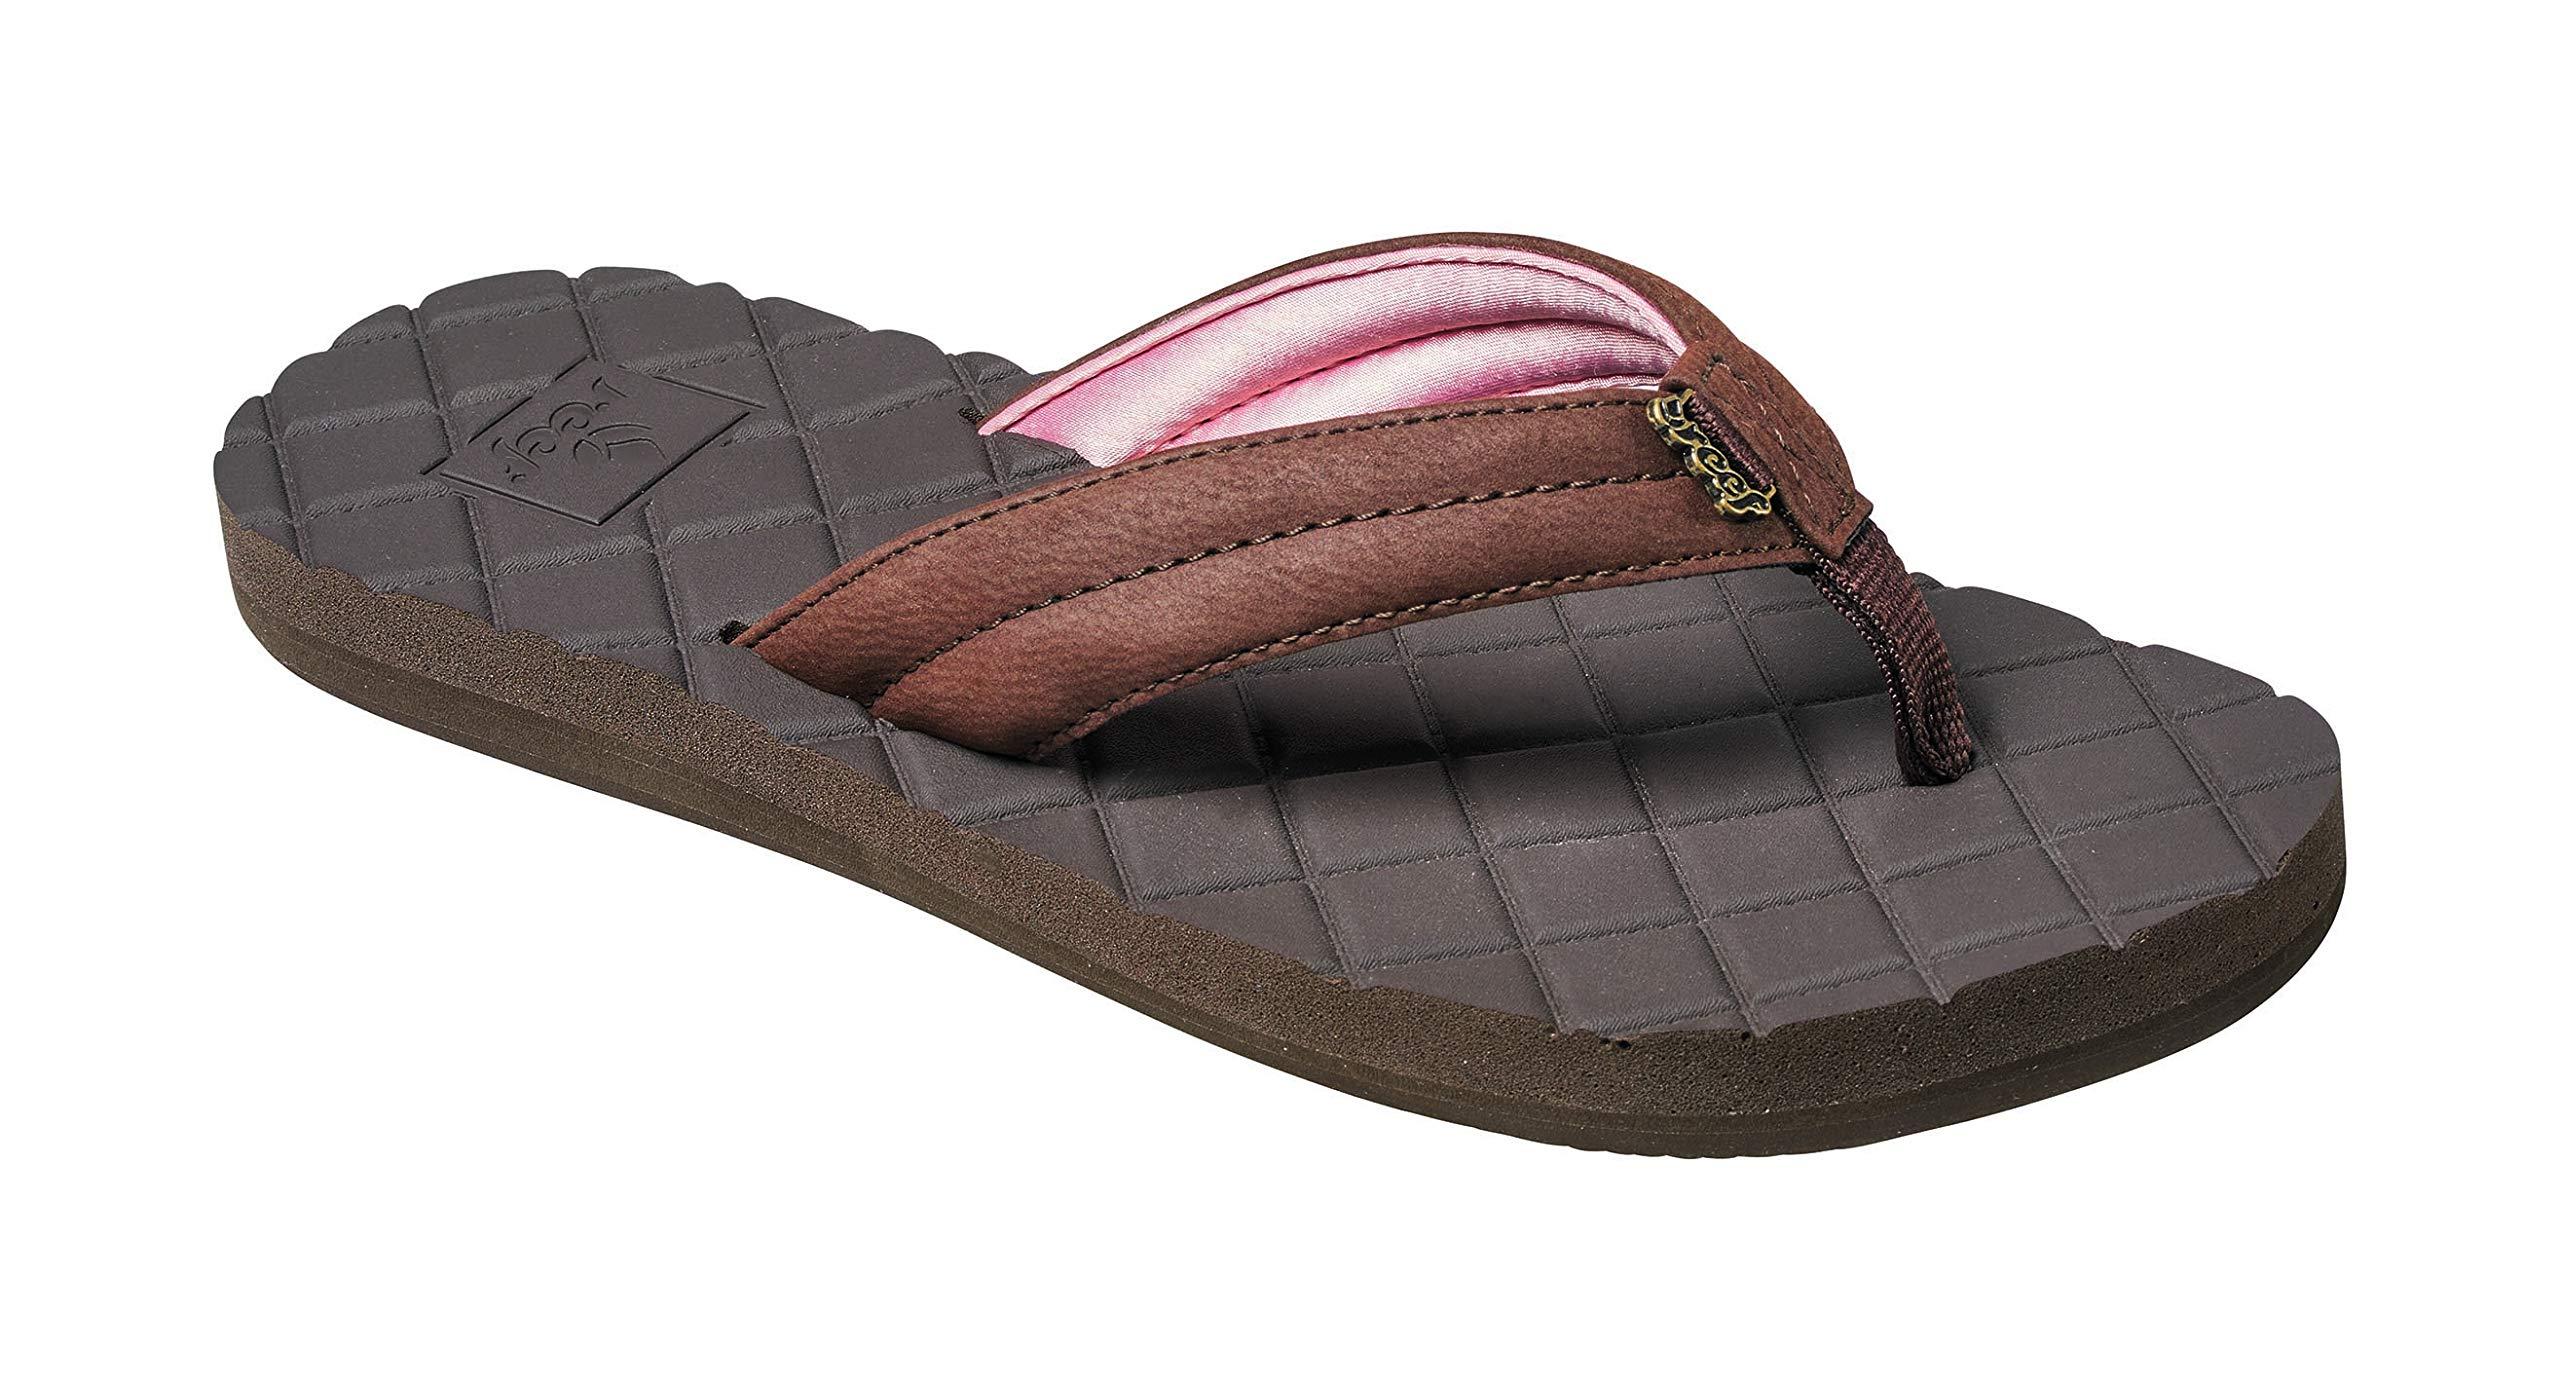 Reef Womens Sandals Star Dreams II